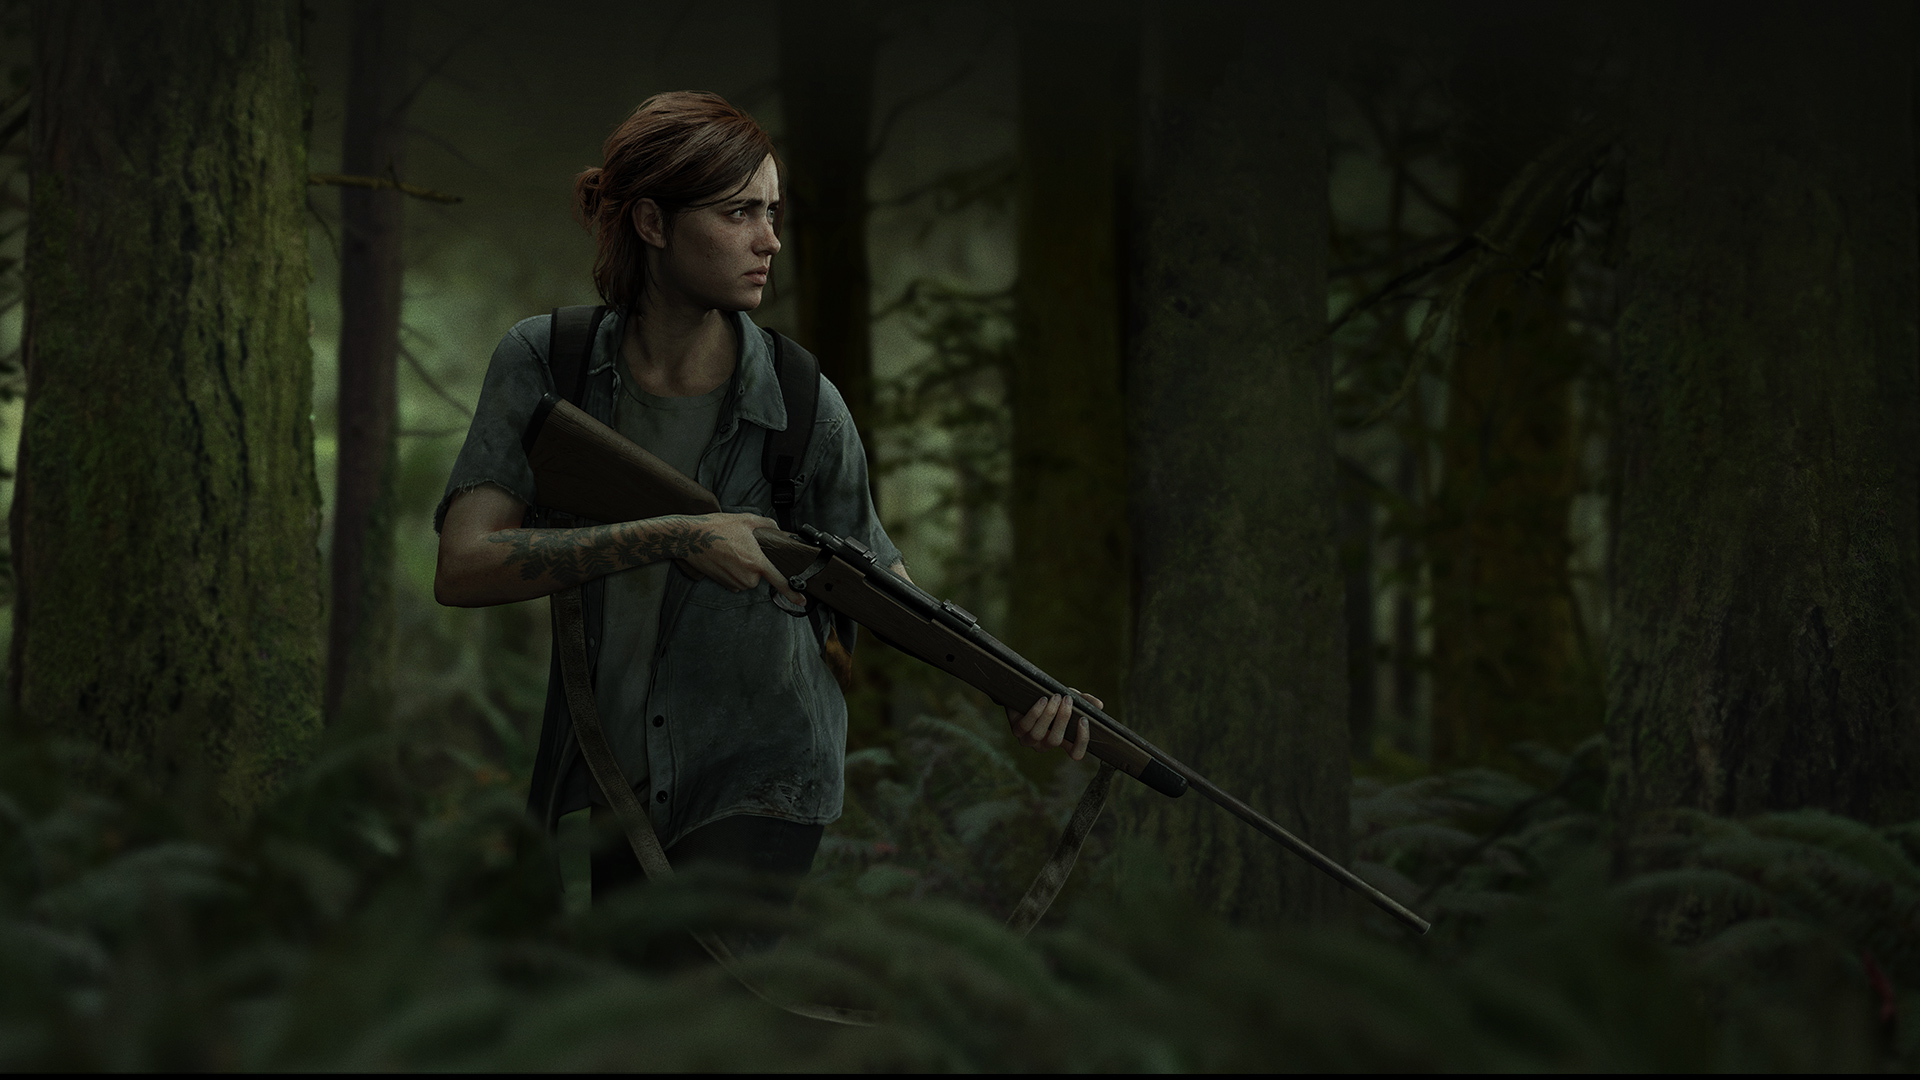 download The Last of Us Part 2 Ellie Wallpaper 1920x1080